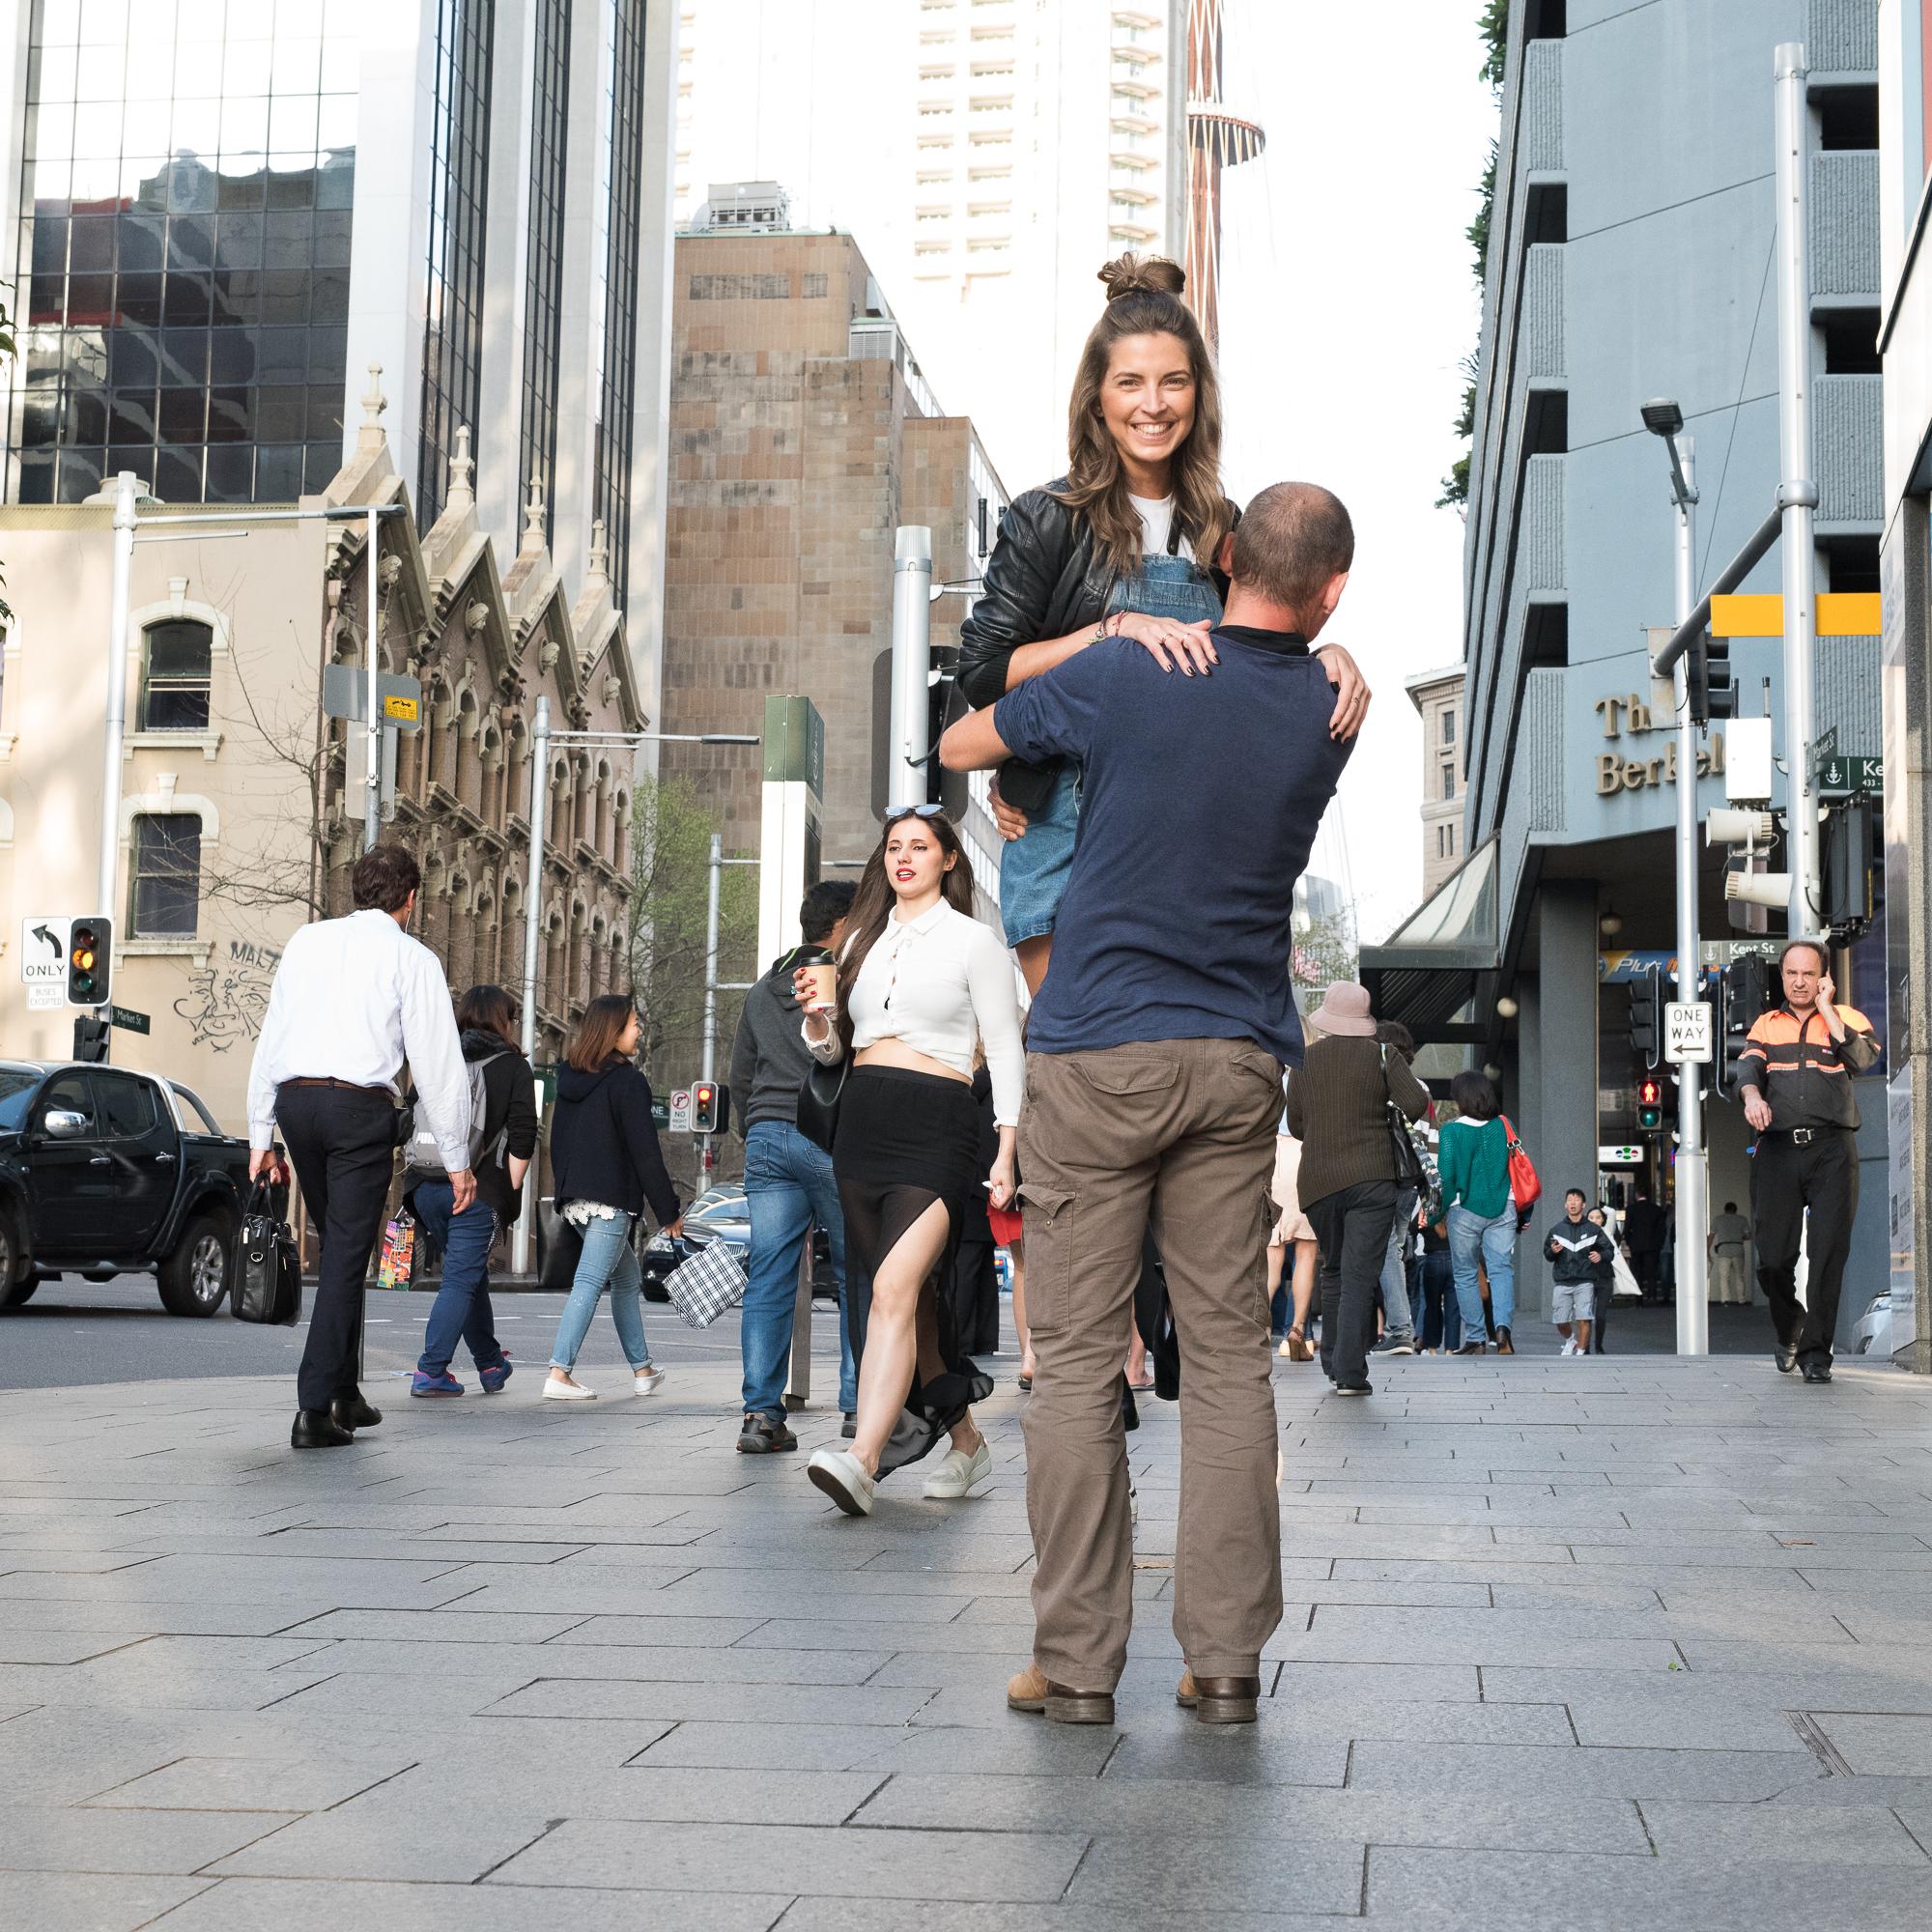 street Sydney - With an naked leg